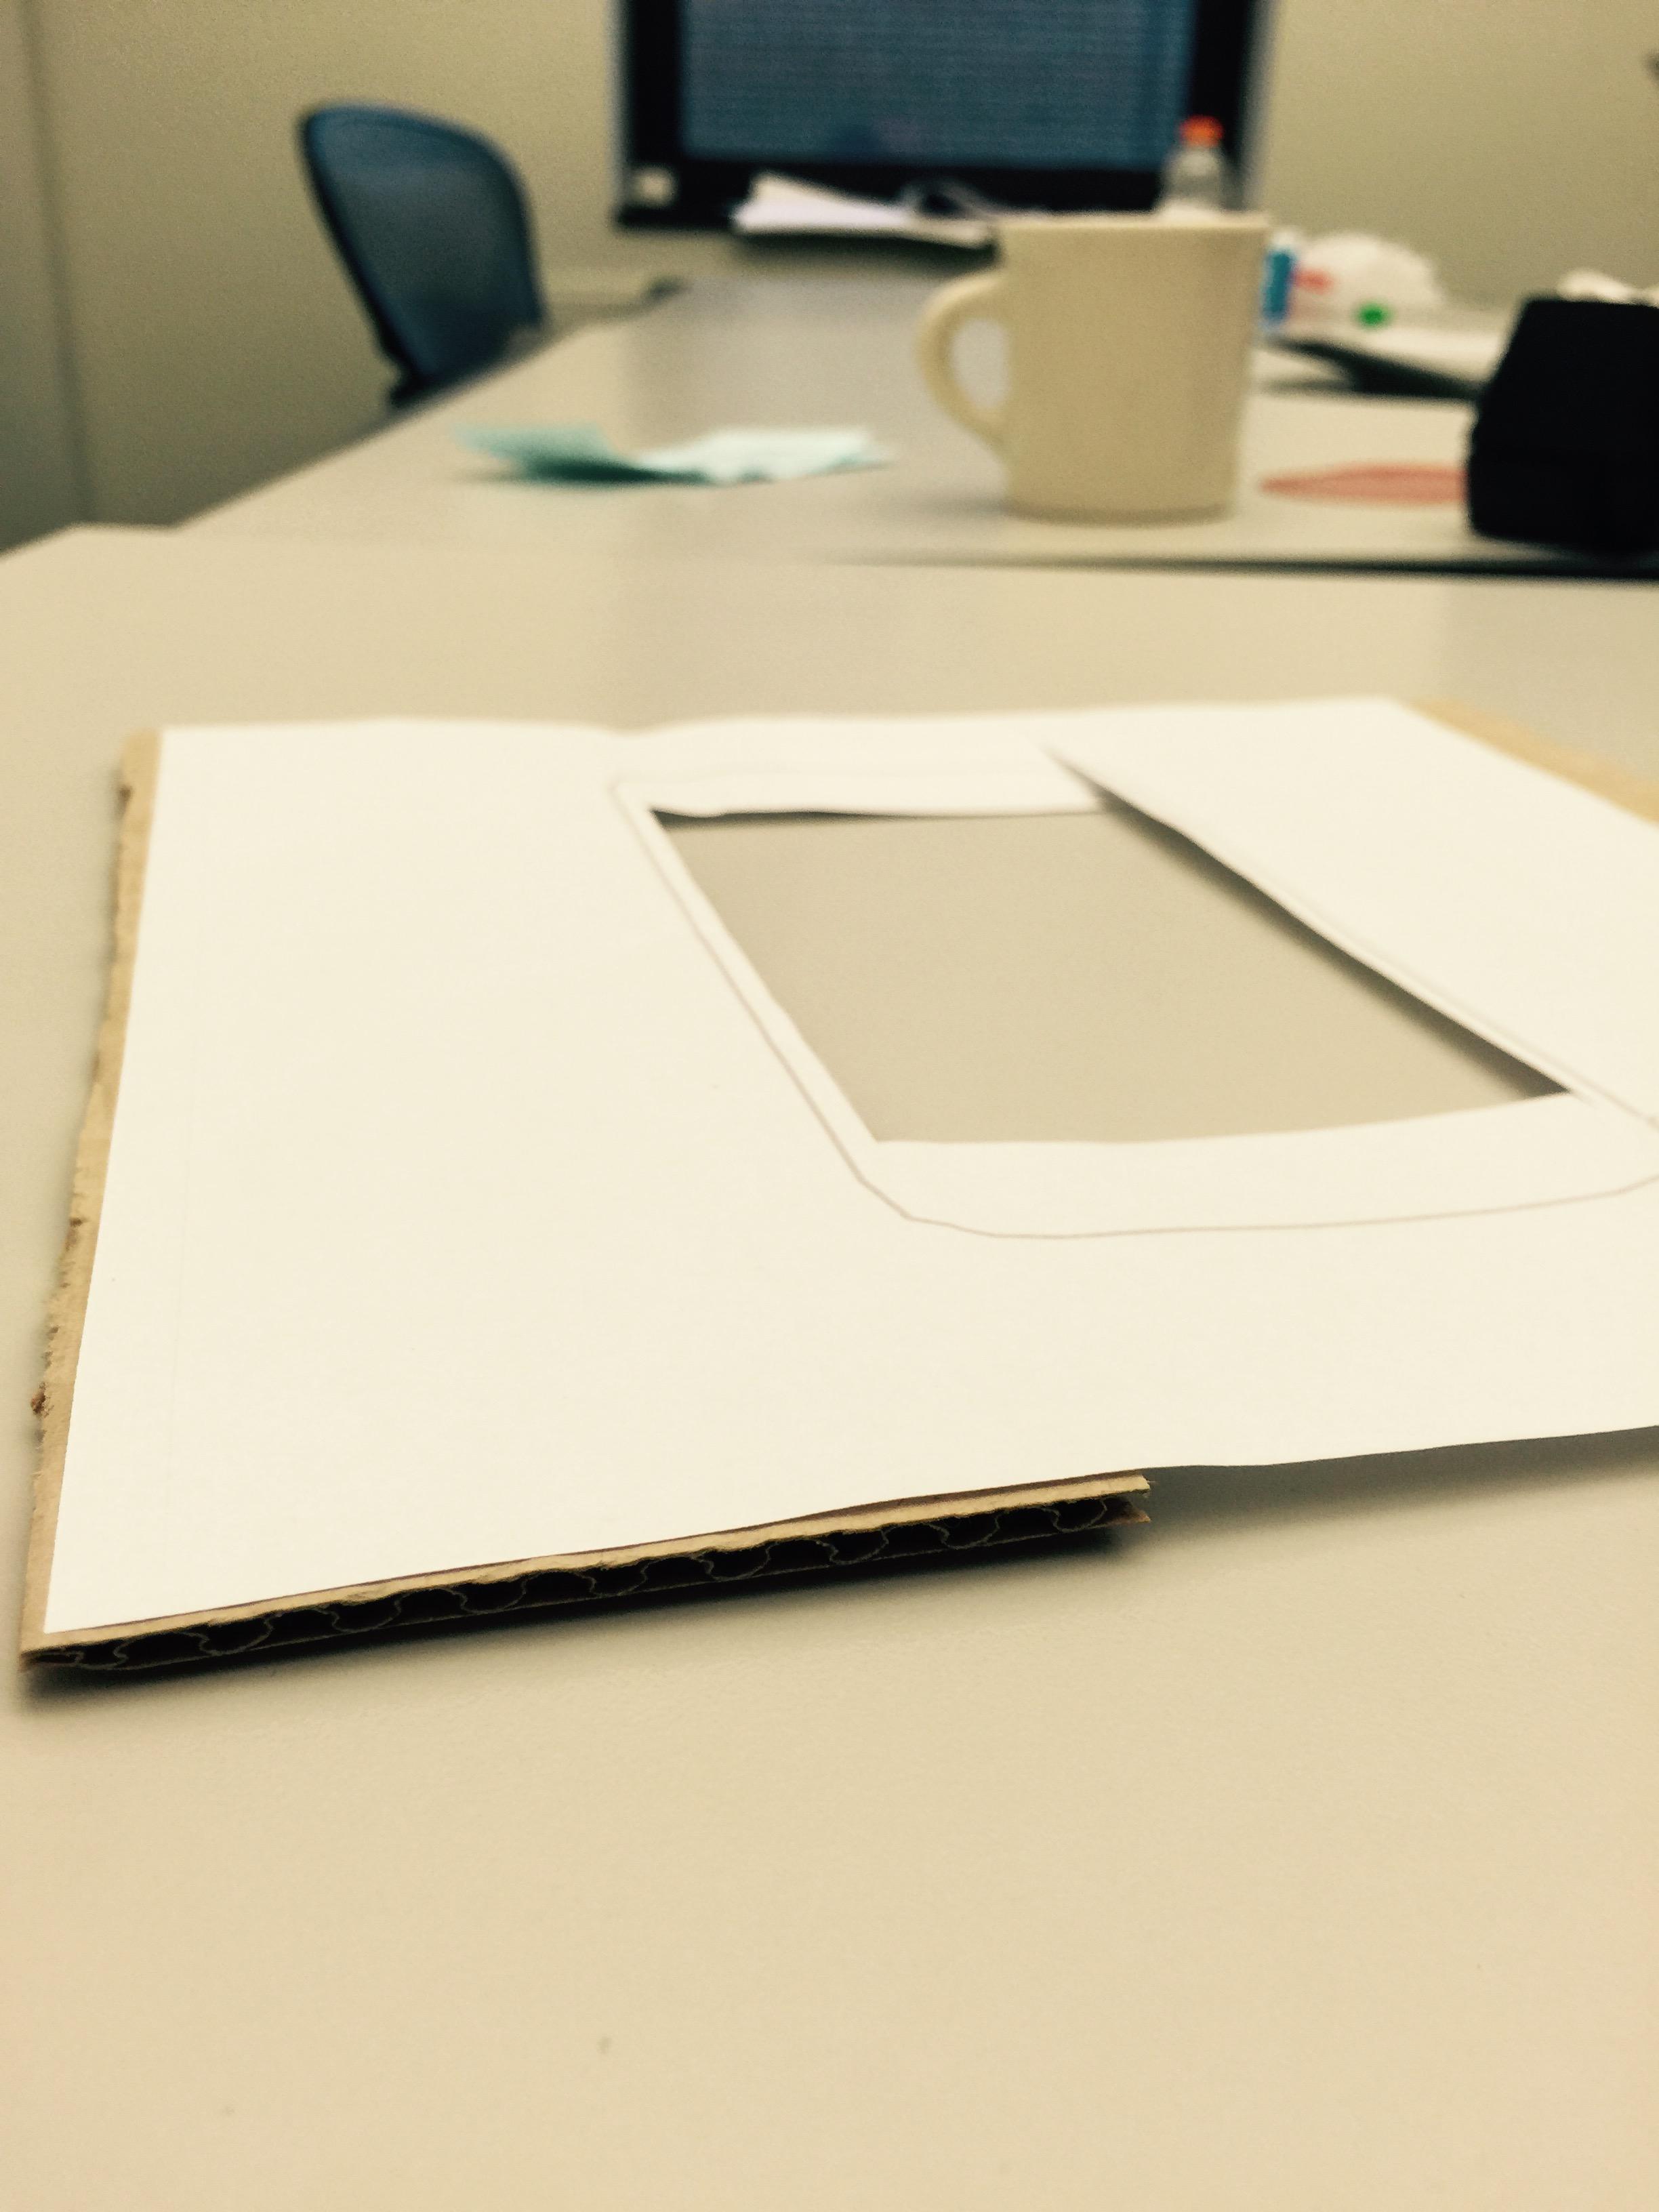 Prototype frame